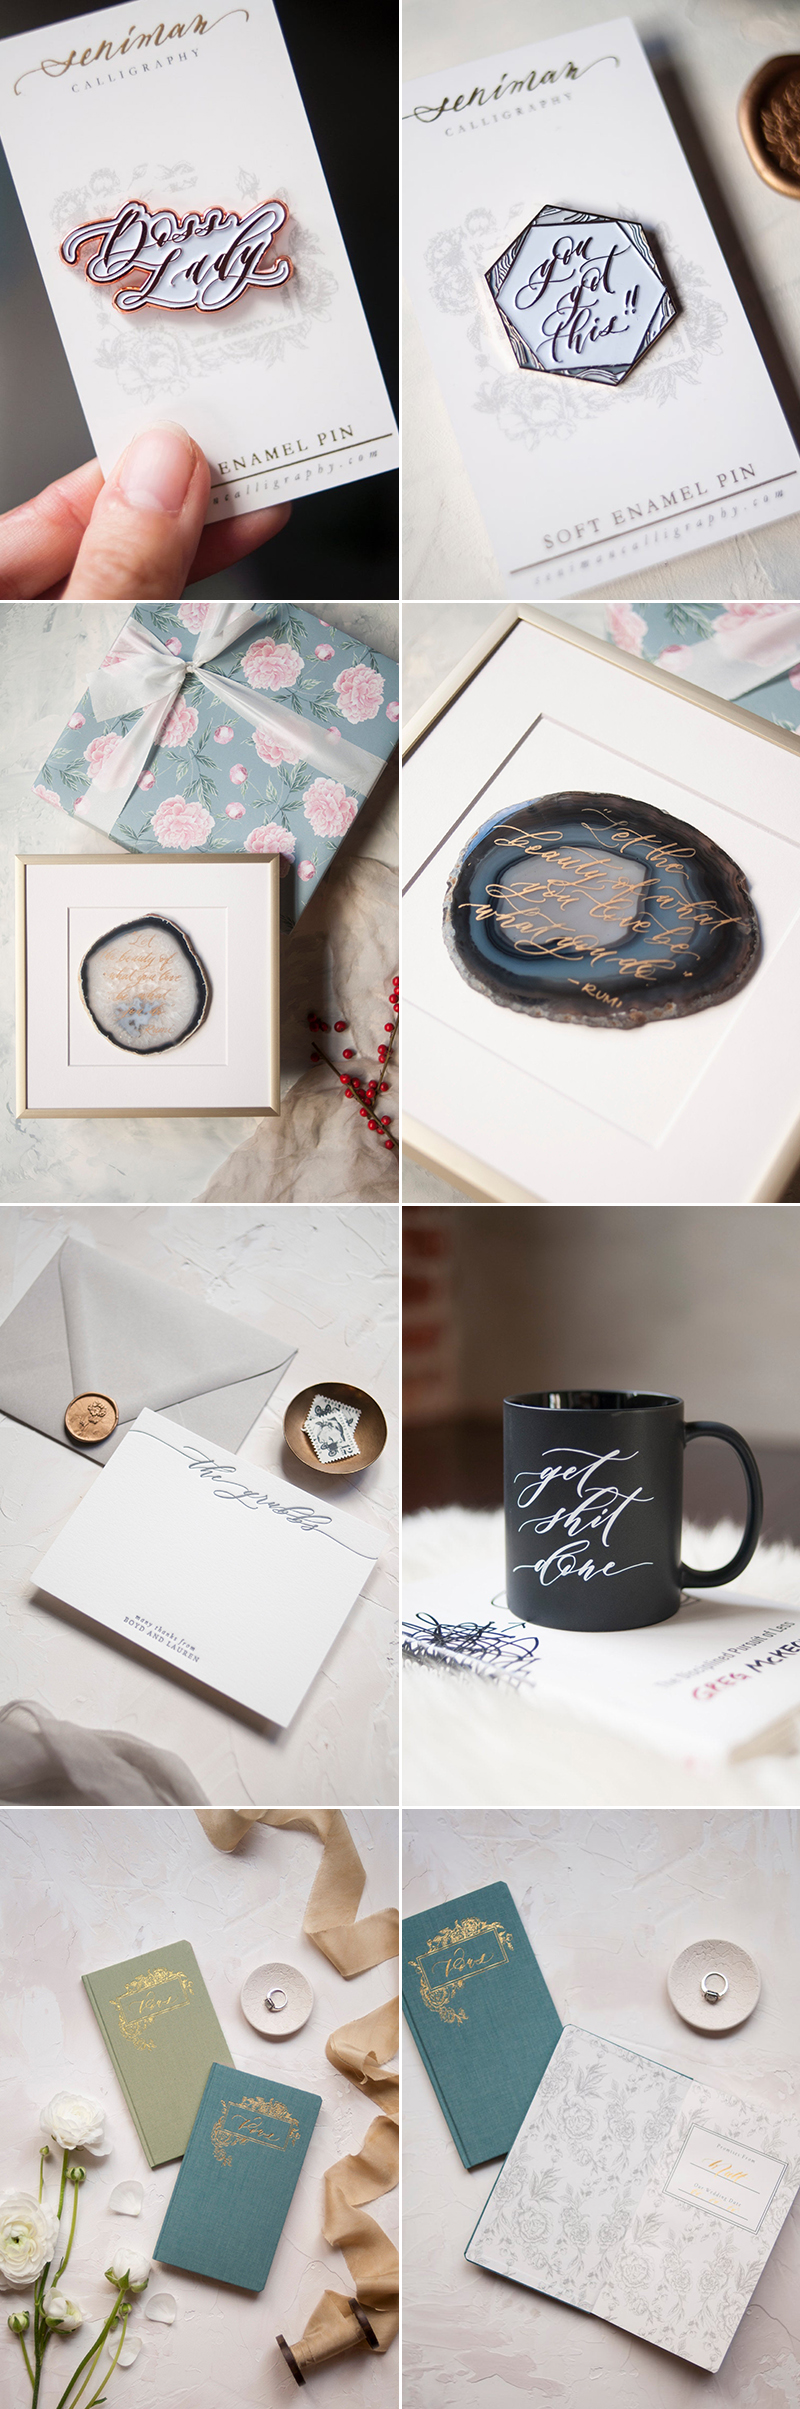 wedding calligraphy favor